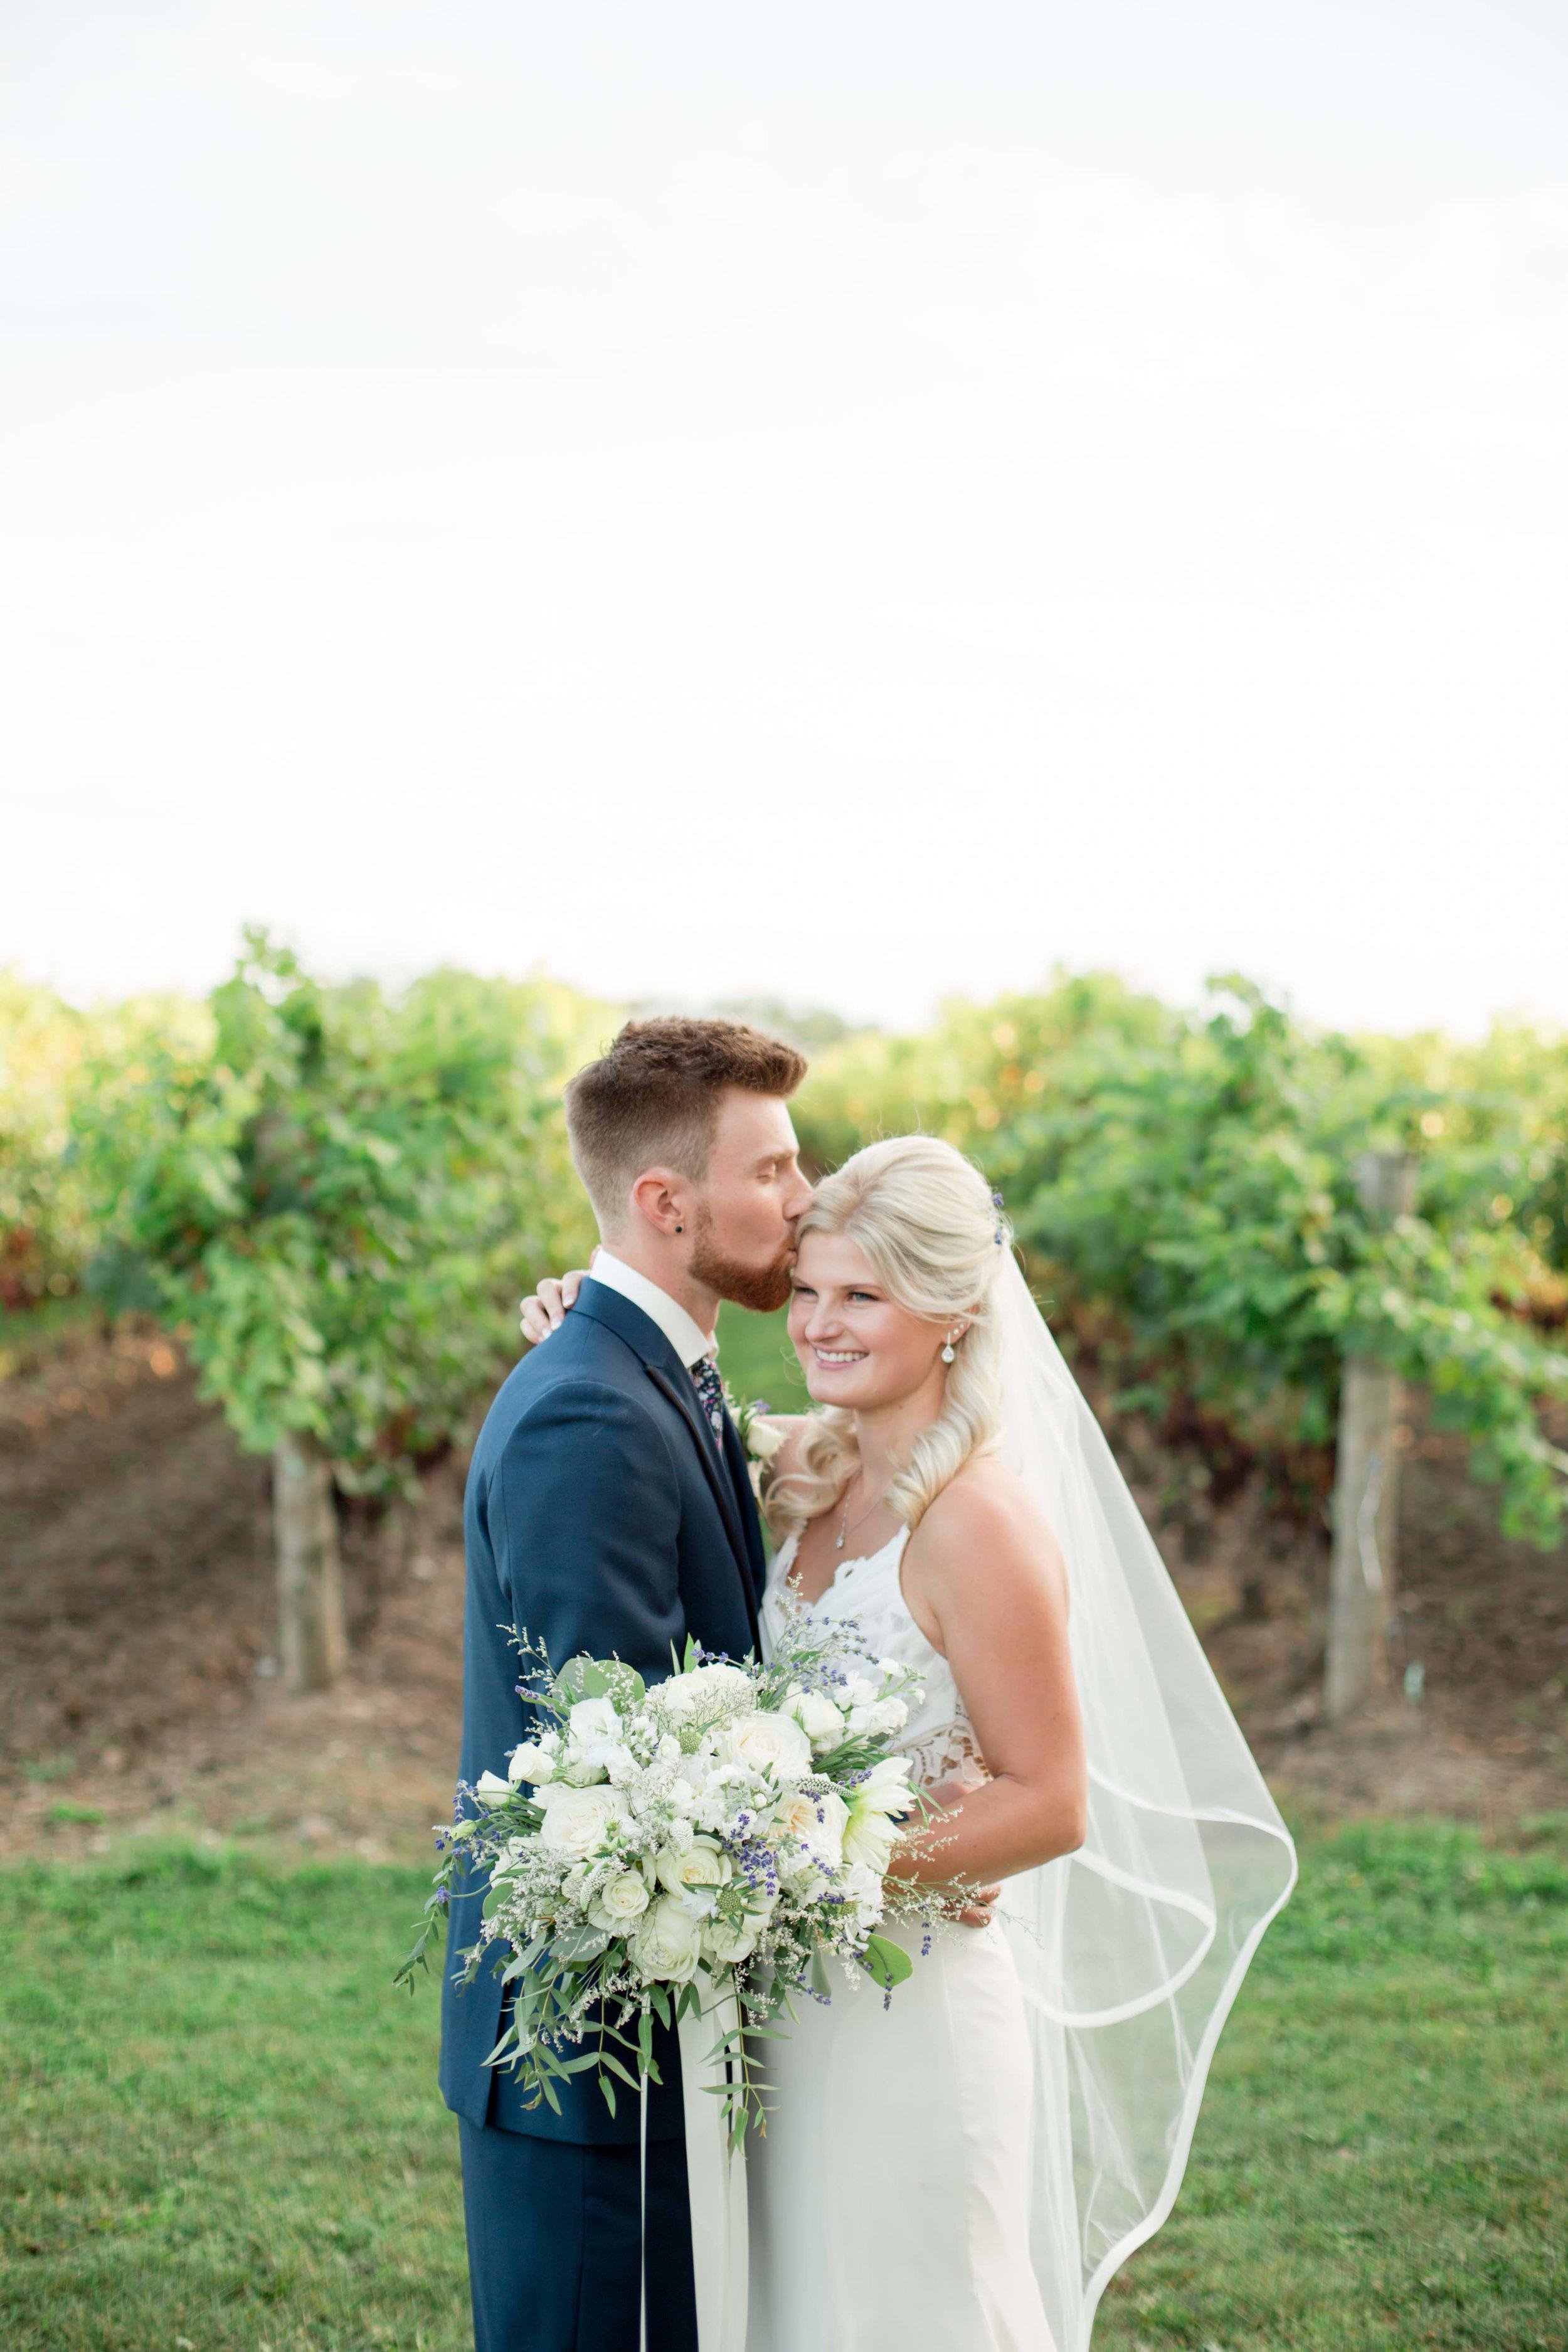 Maddy___Brandon___Daniel_Ricci_Weddings_High_Res._Finals_443.jpg